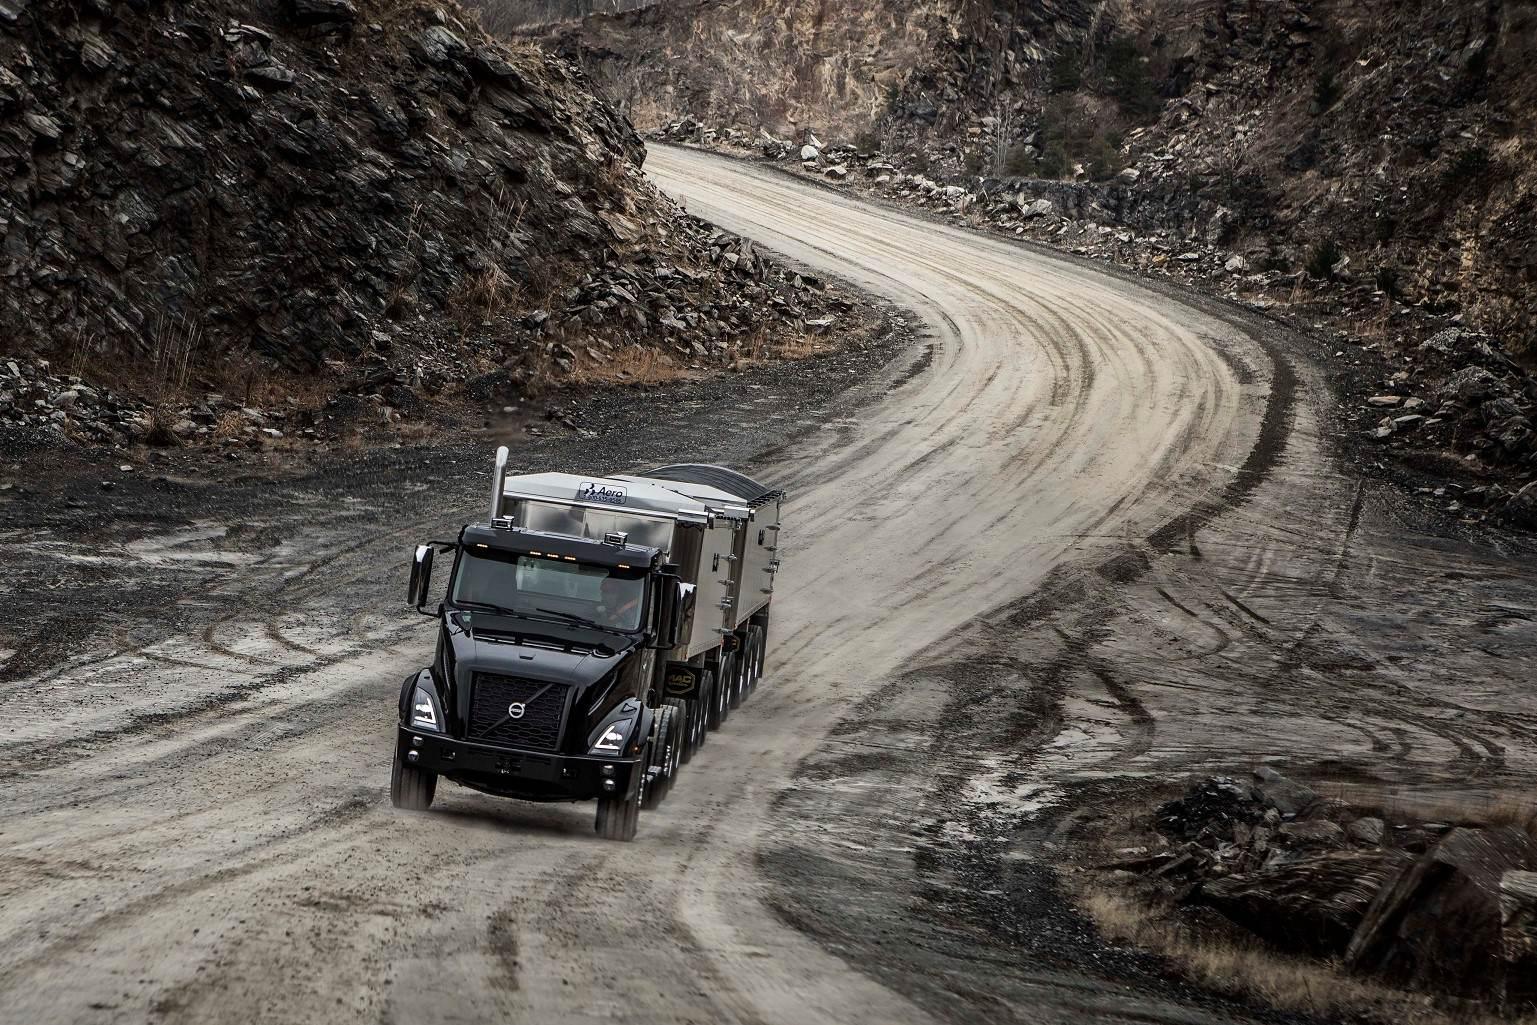 Volvo unveils new VNX Series trucks designed for heaviest of